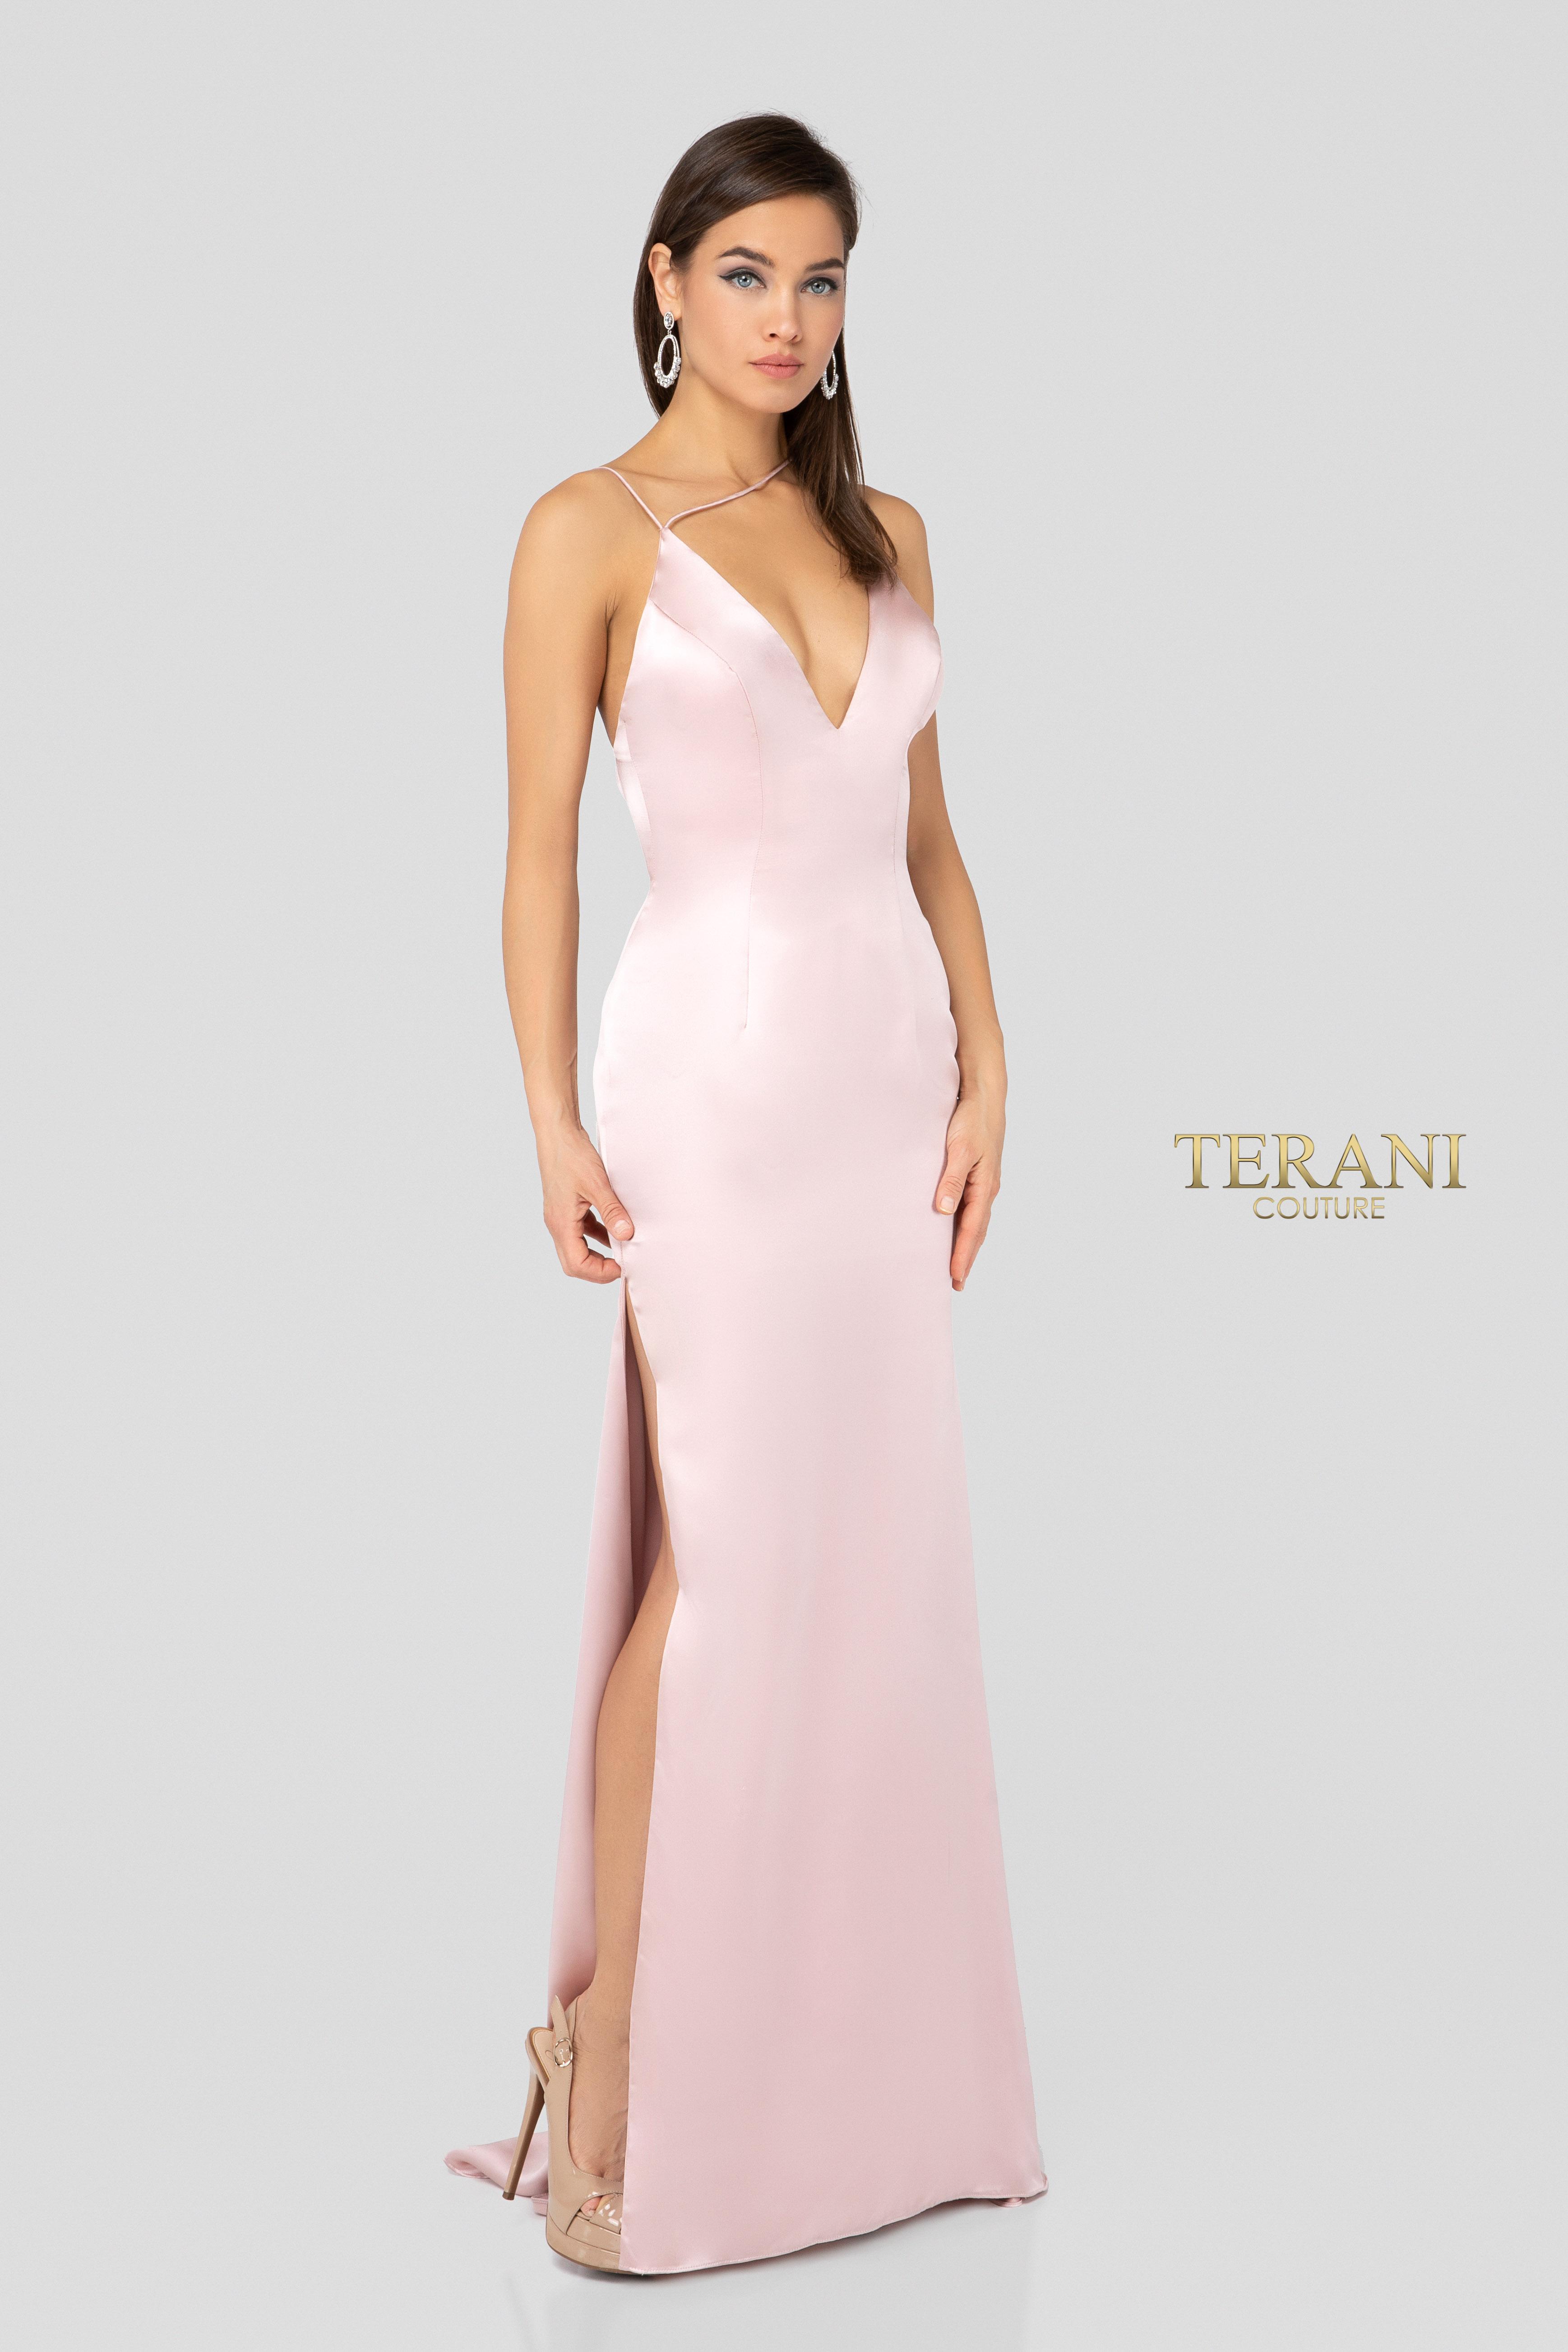 8b6a627218e Find Terani Stores